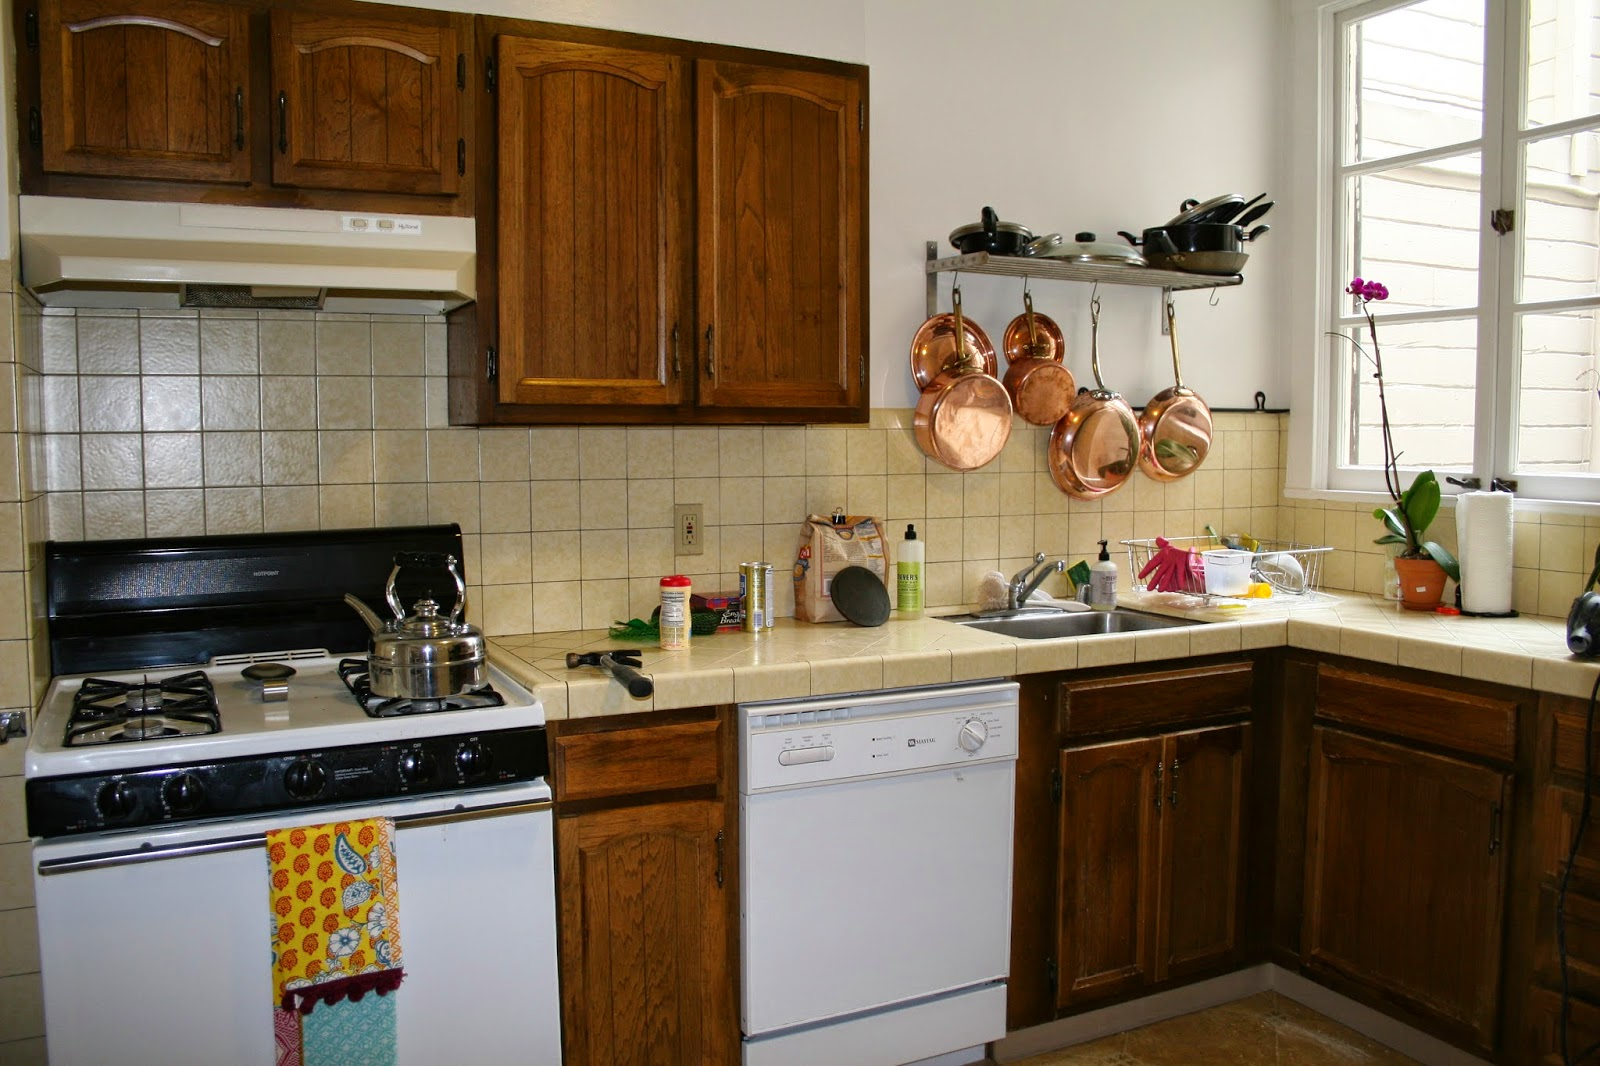 customkitchencabinets blogspot repainting kitchen cabinets